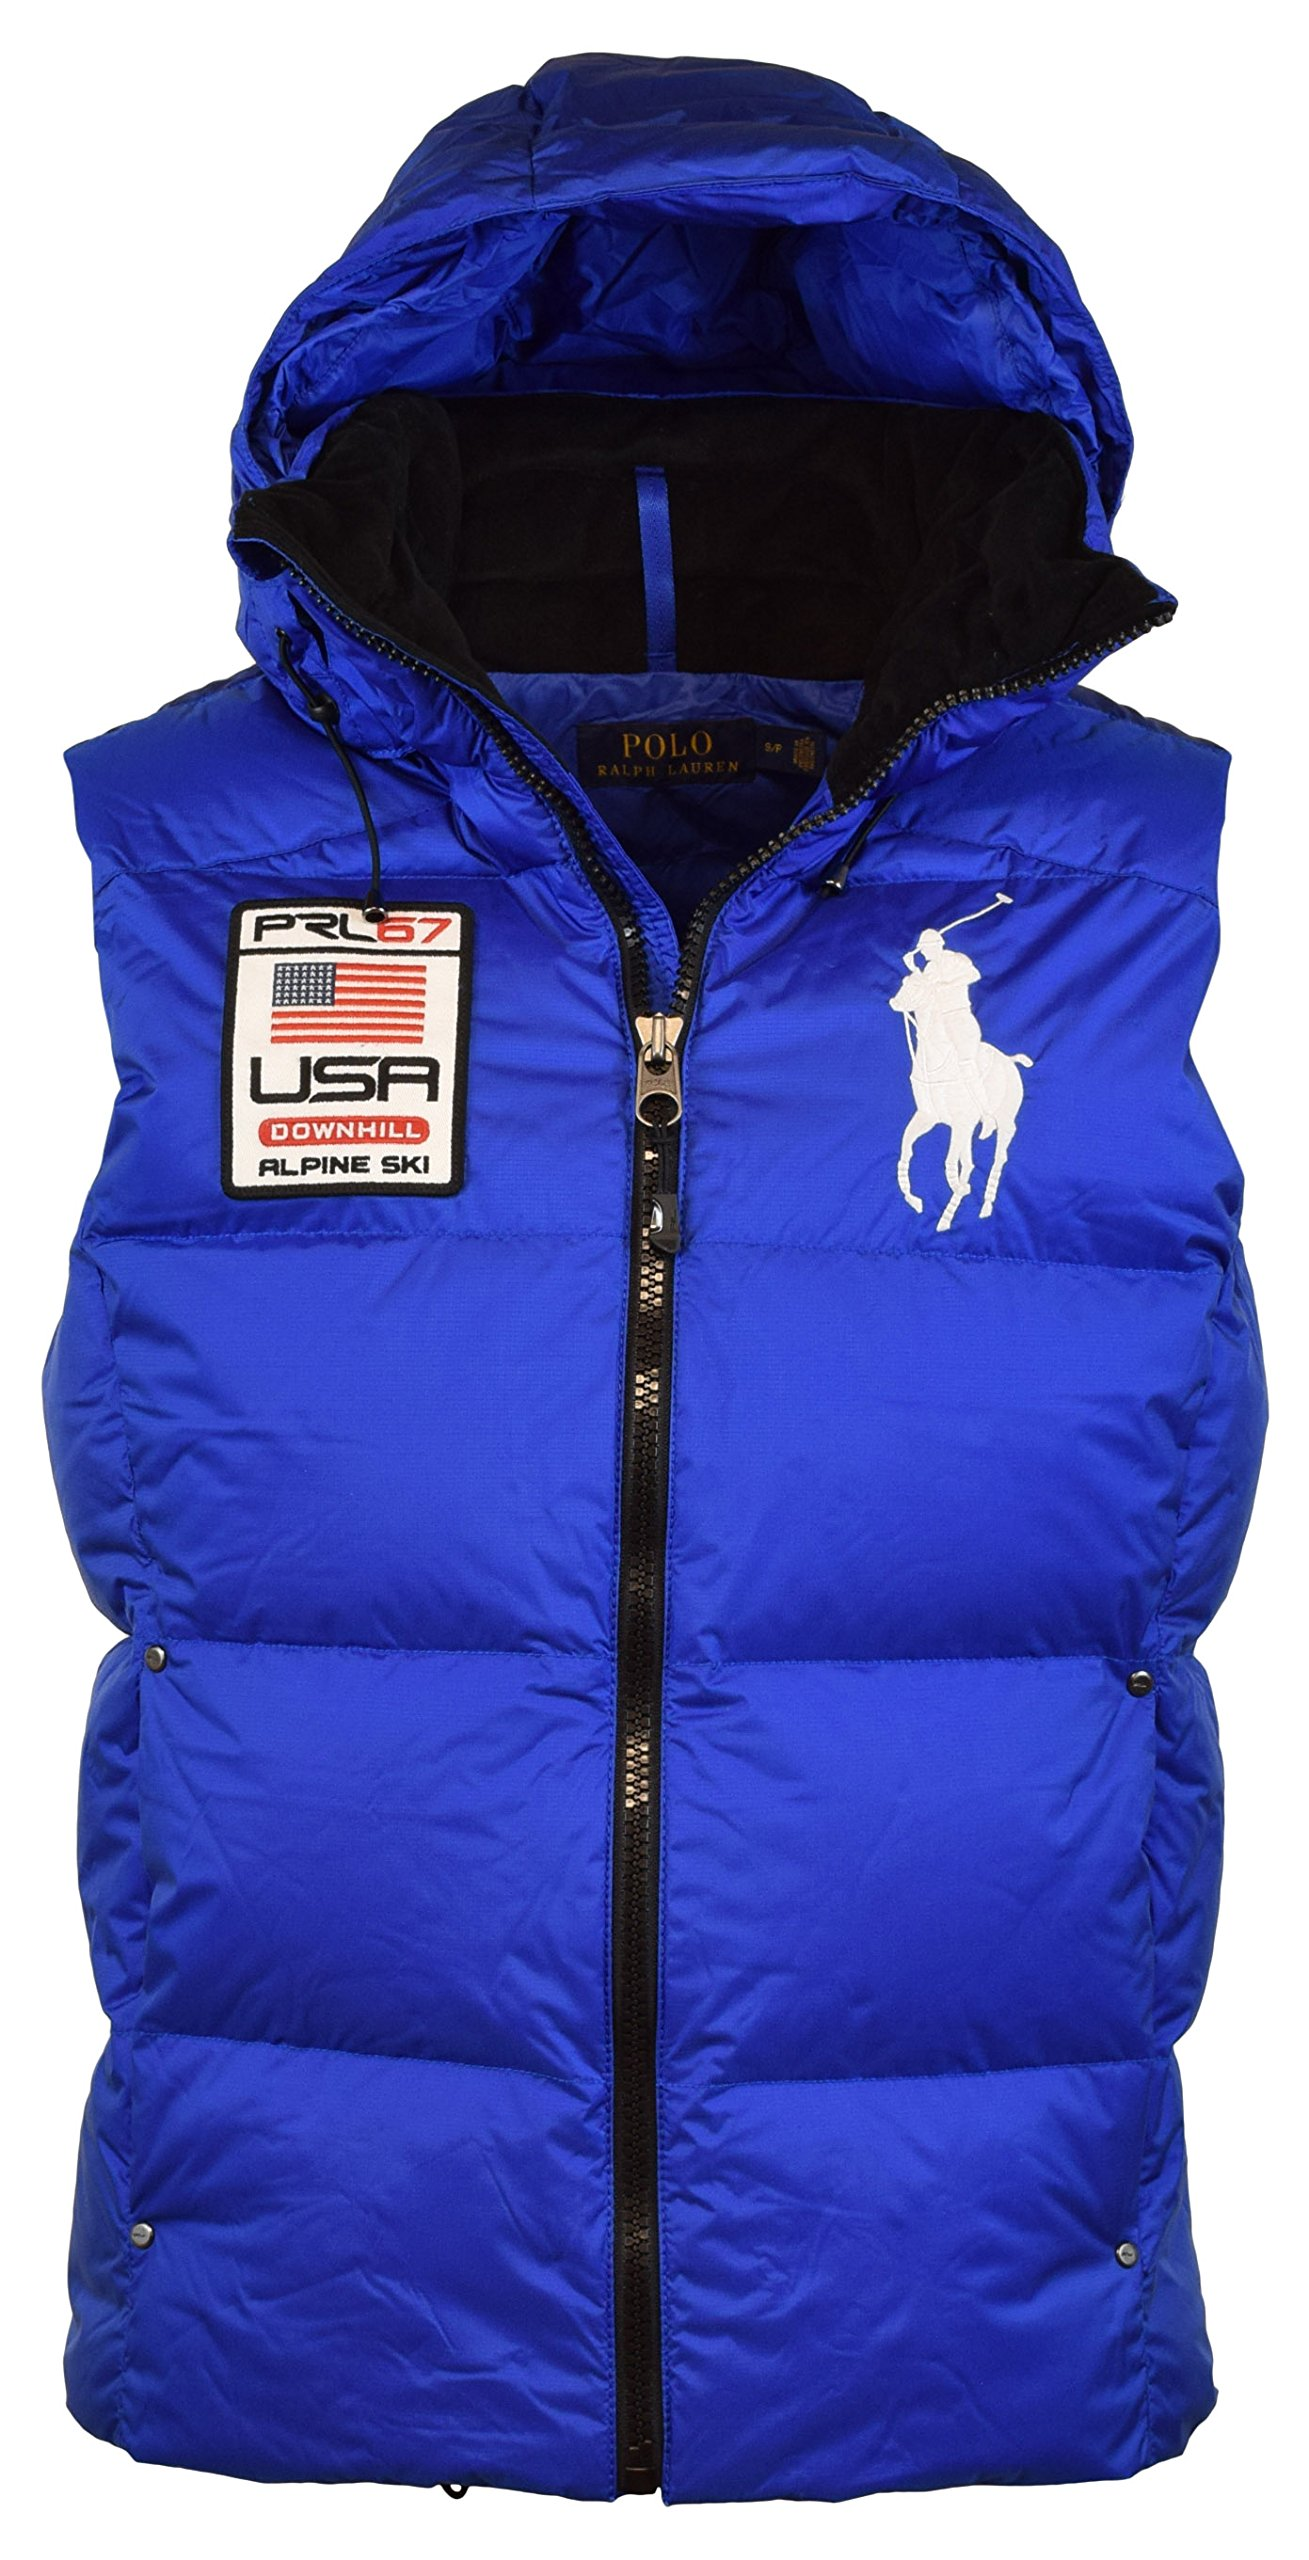 Lauren Polo Mens Ski Galleon Alpine Ralph Puffer Patch Big Pony PkwOn0